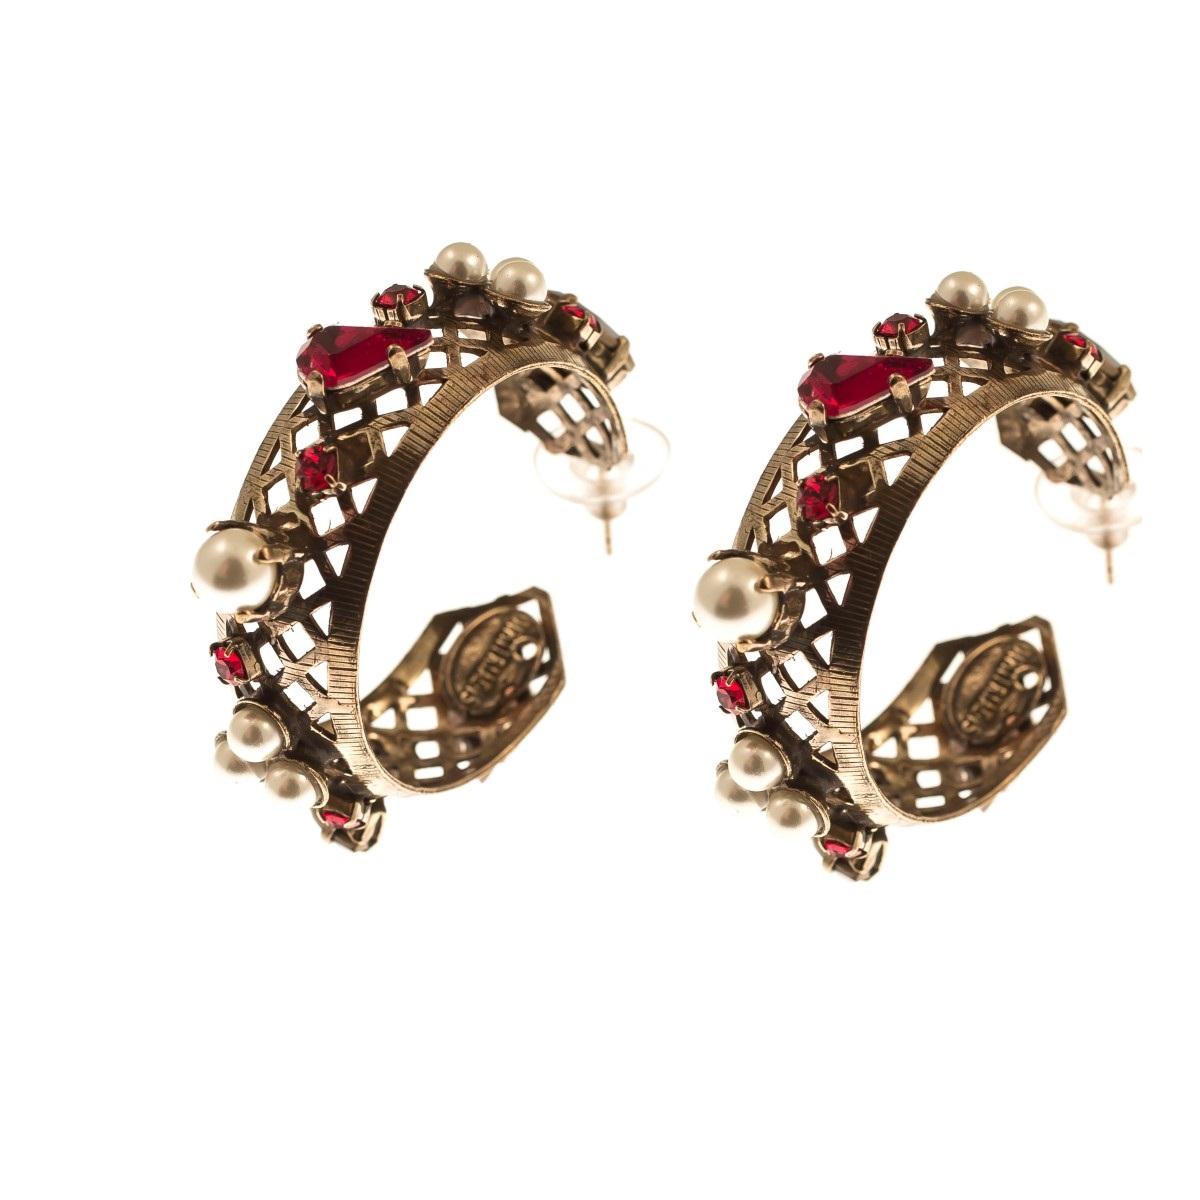 ARTWEAR DIMITRIADIS - Γυναικεία σκουλαρίκια κρίκοι ARTWEAR DIMITRIADIS με στρας  γυναικεία αξεσουάρ κοσμήματα σκουλαρίκια